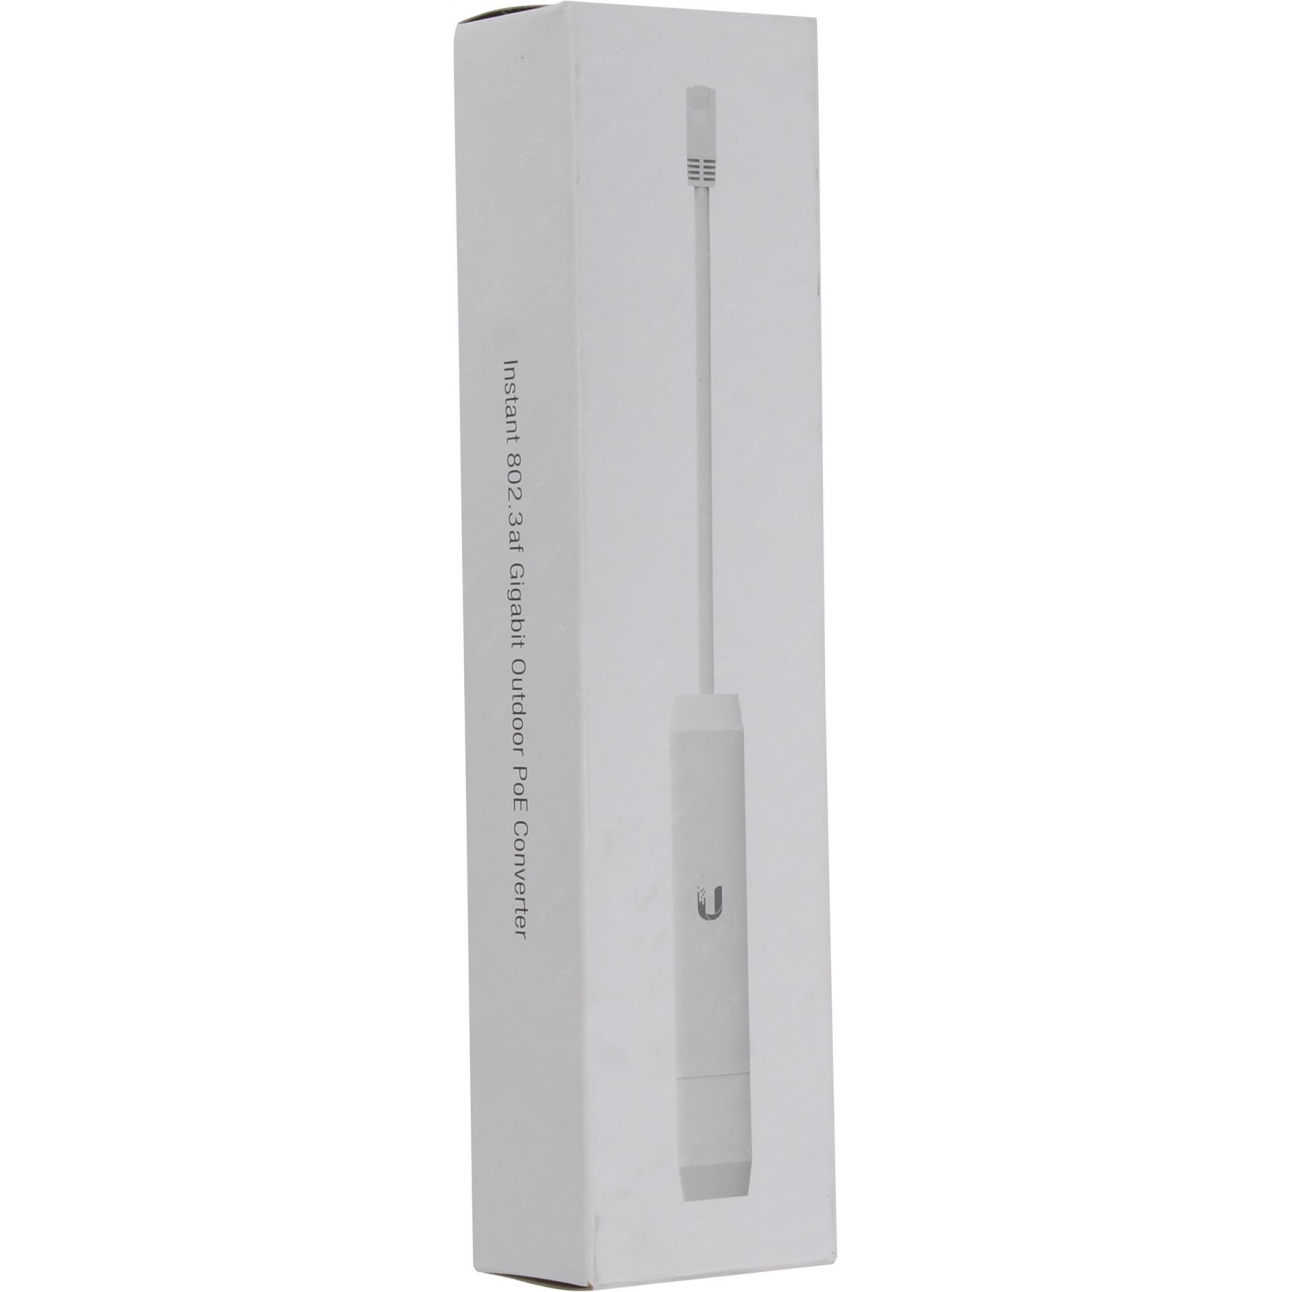 Адаптер Ubiqiuti Gigabit PoE 48V/24V, 802.3af Ubiquiti Outdoor